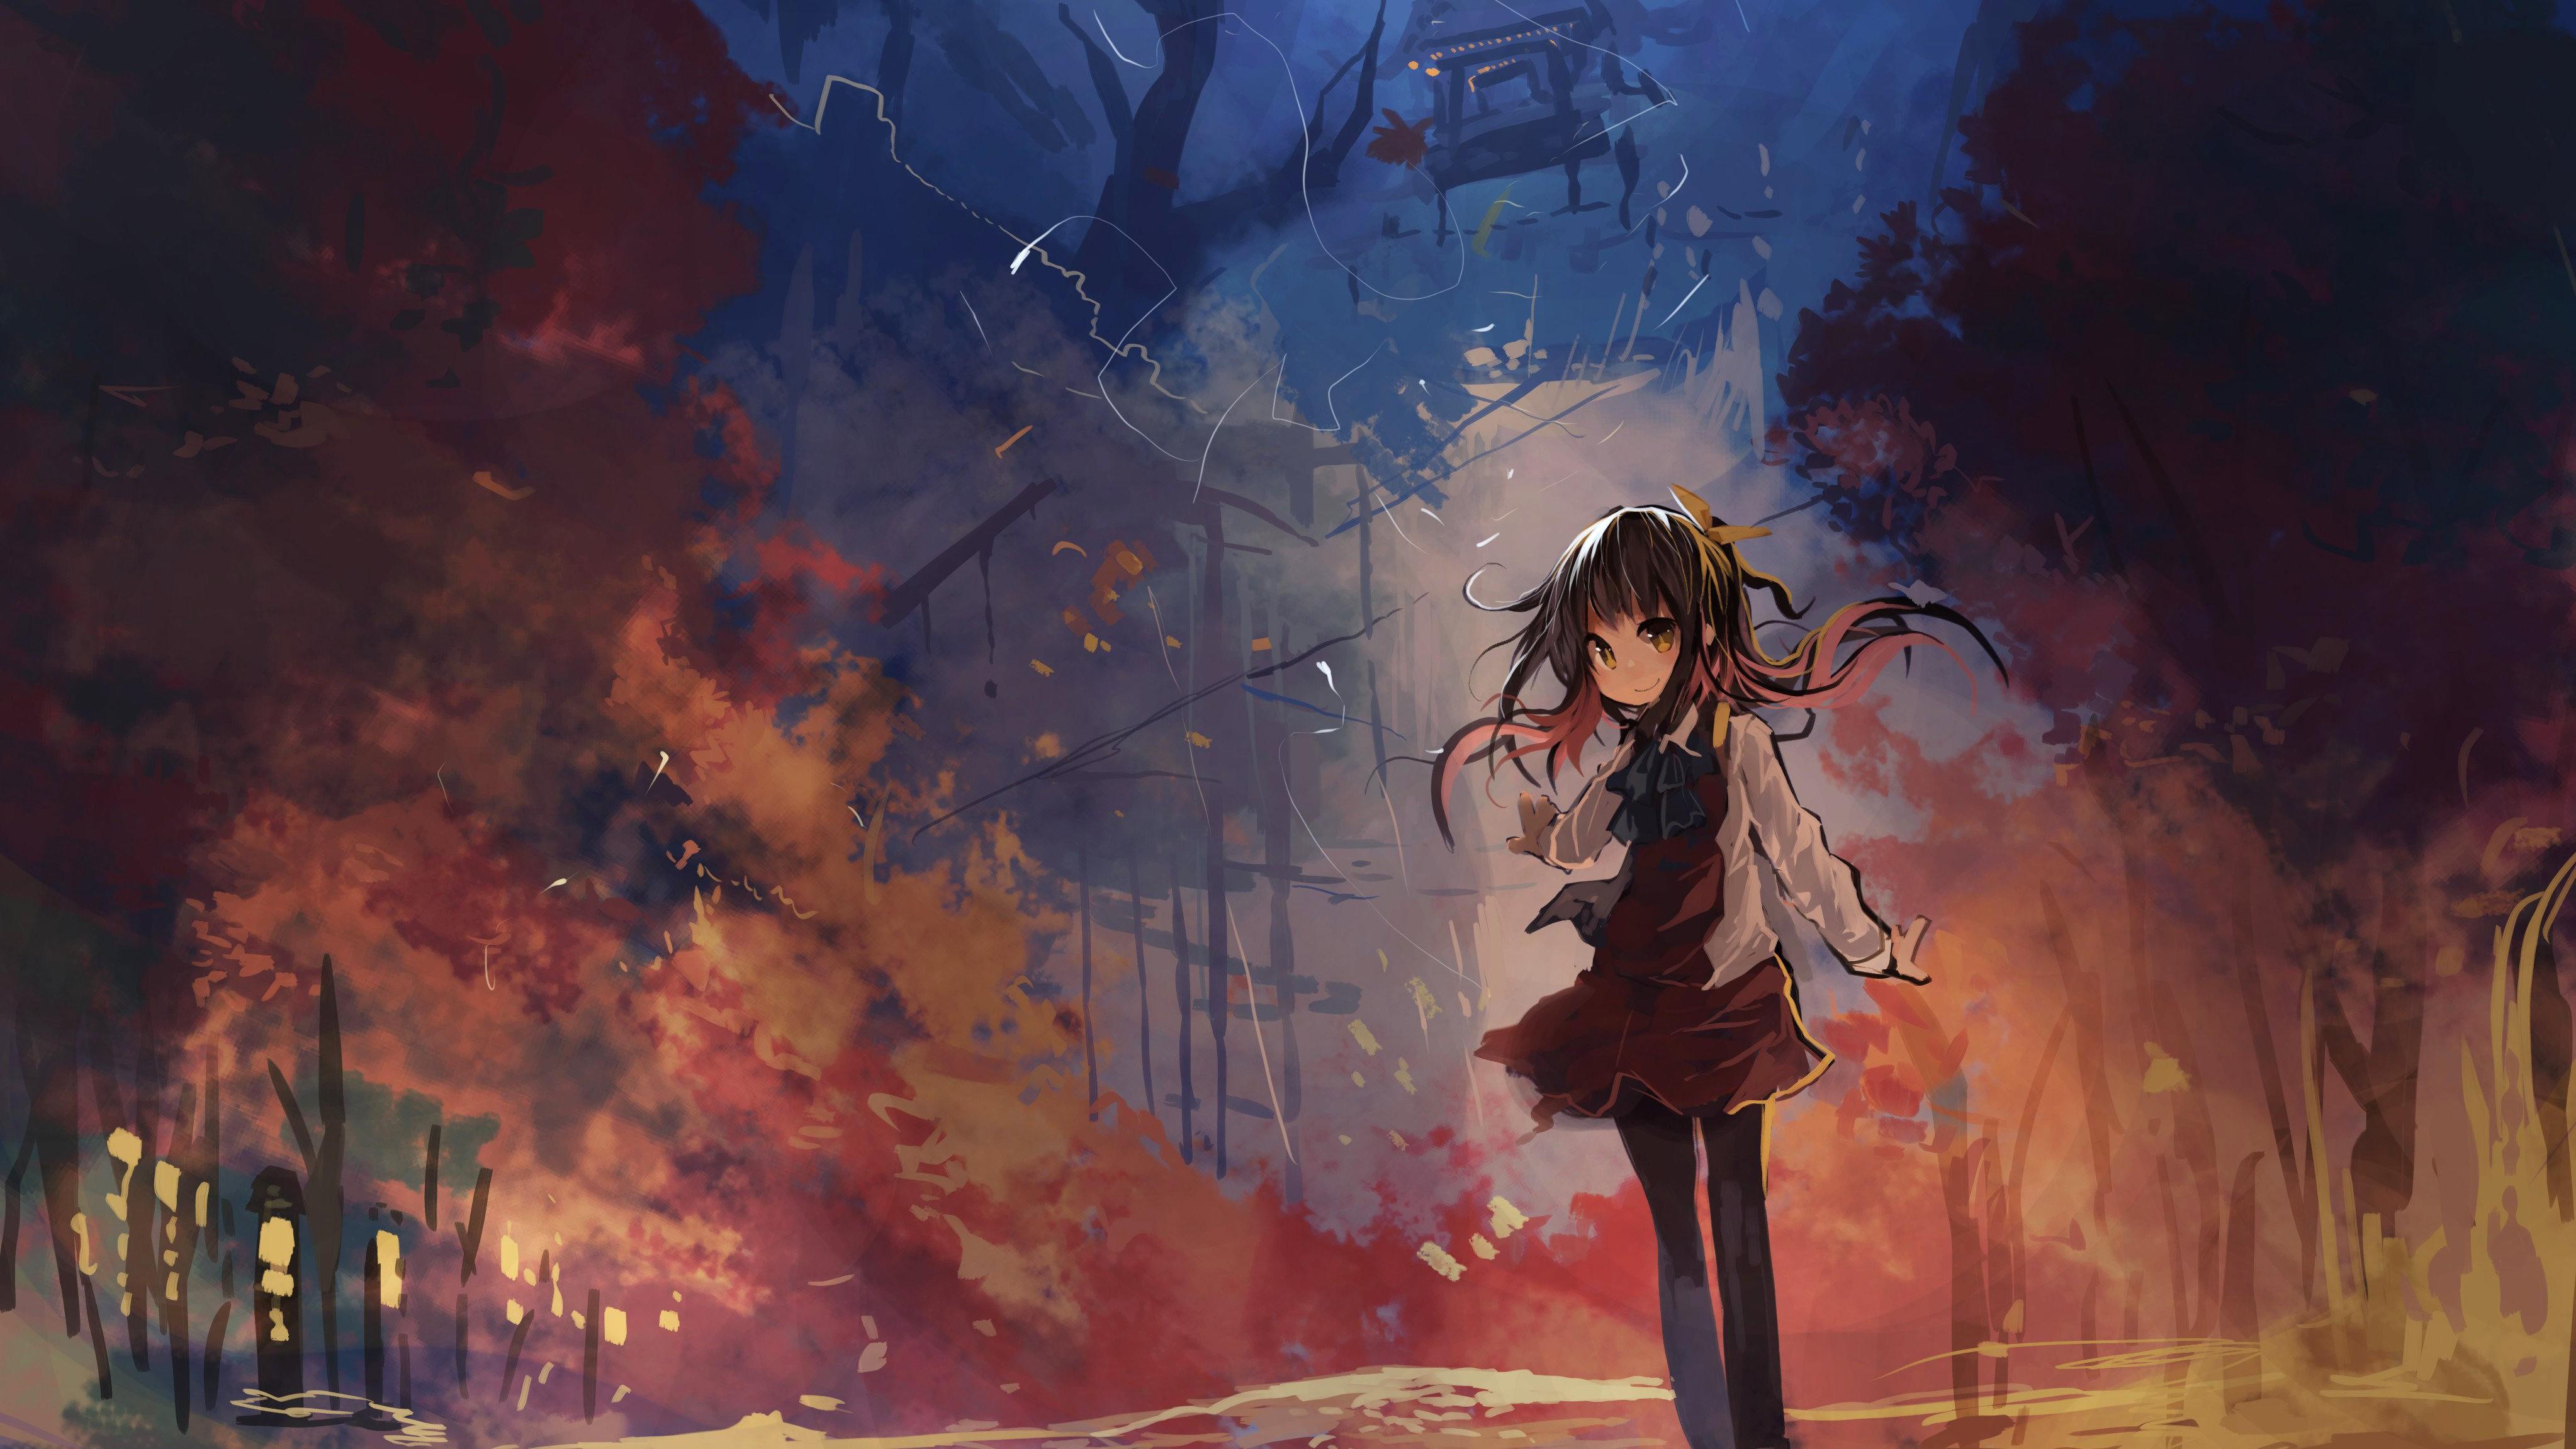 Anime 4093x2302 anime anime girls Kantai Collection fall moescape